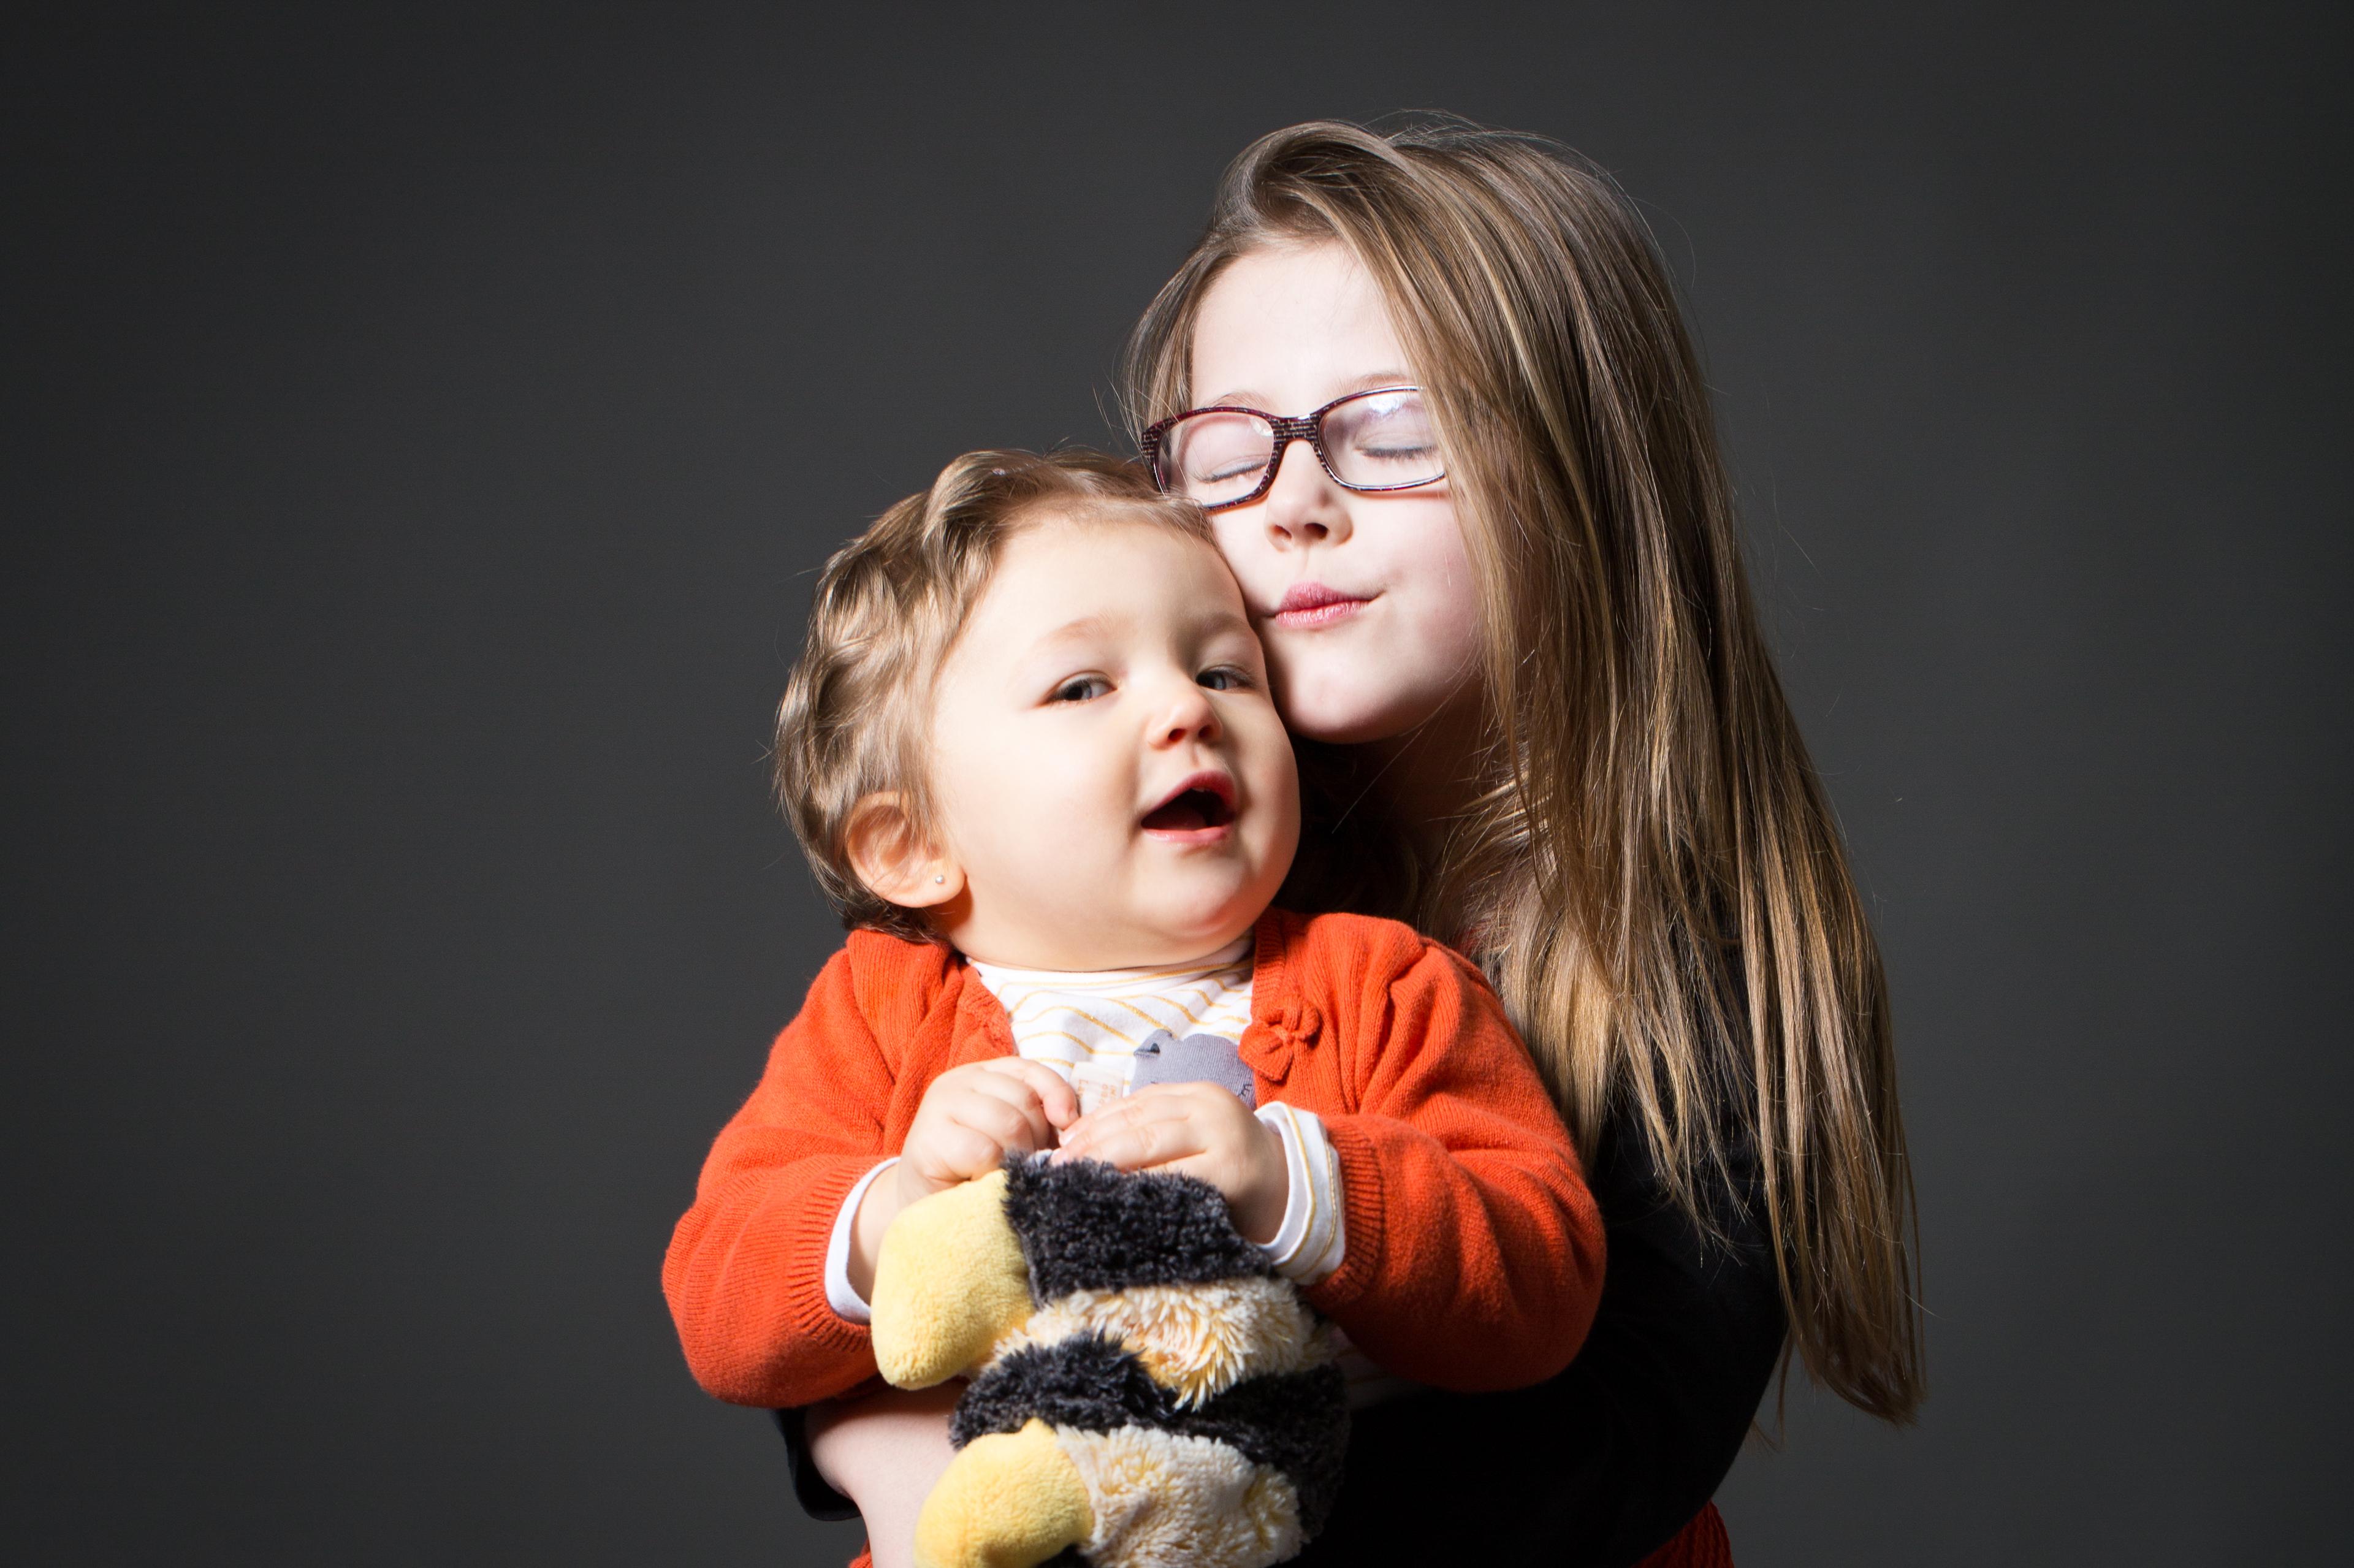 Photographe professionnel | Famille